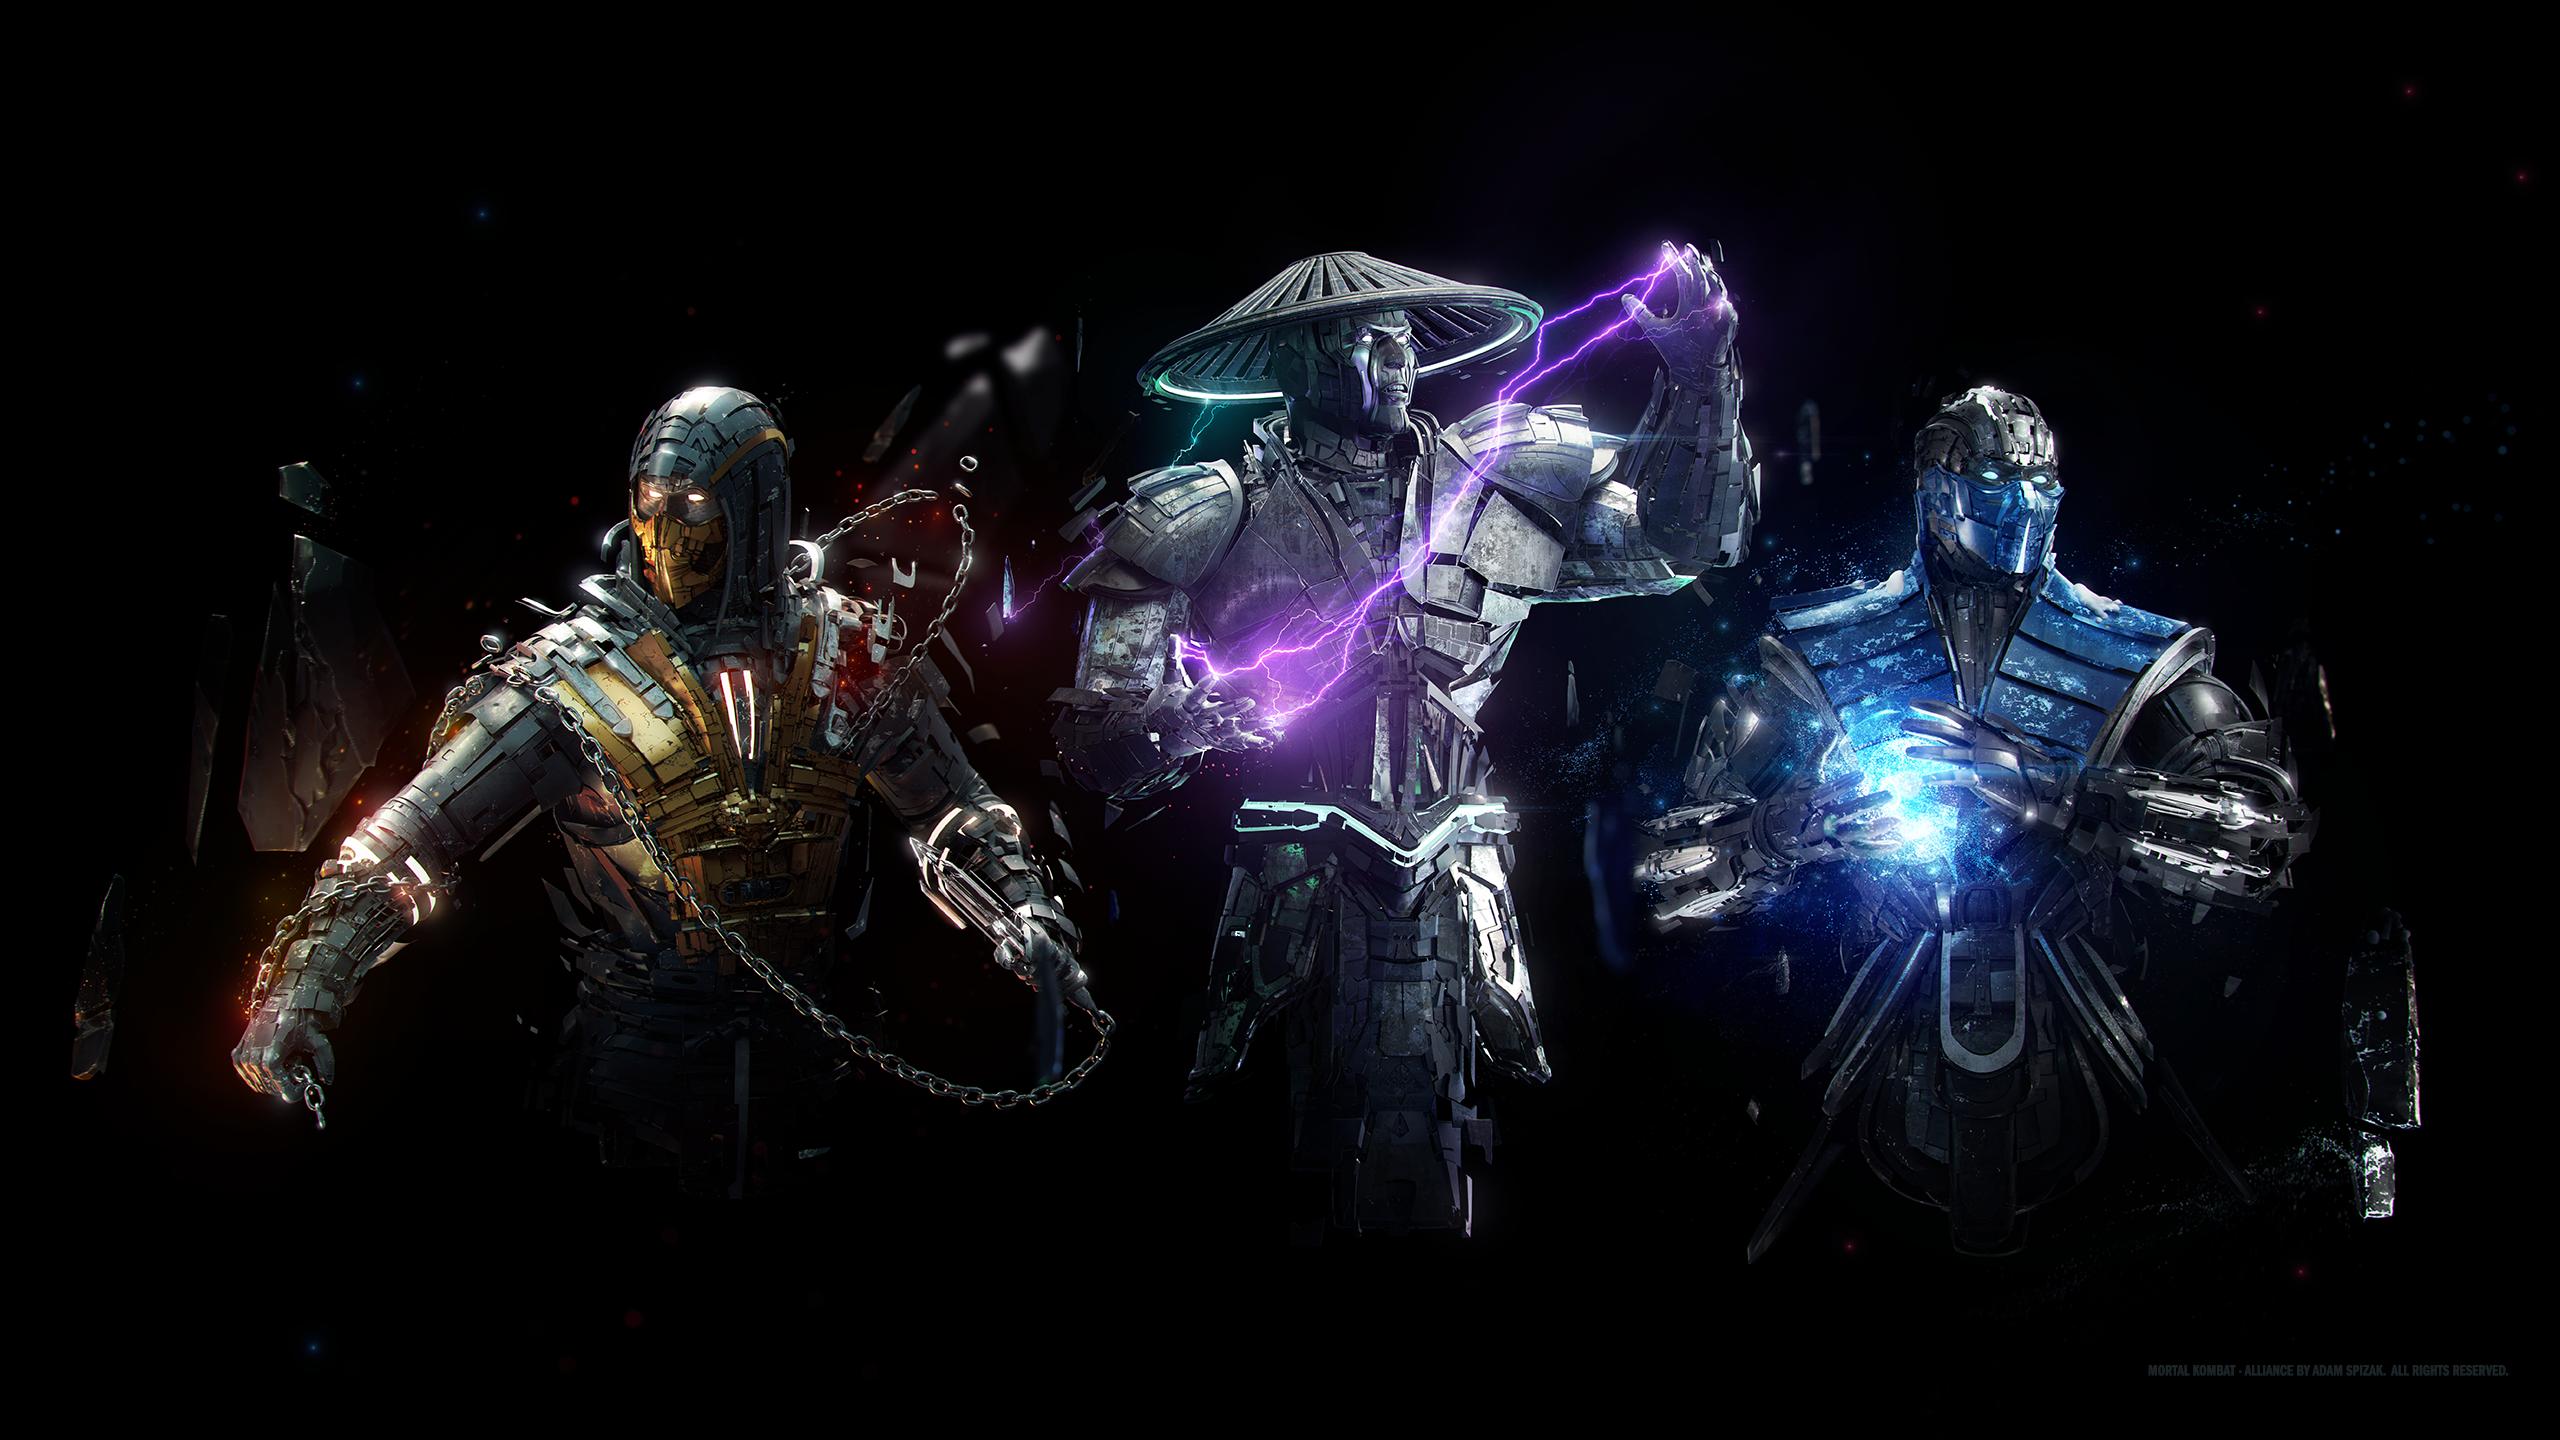 Wallpaper Mortal Kombat Raiden Sub Zero Scorpion 2560x1440